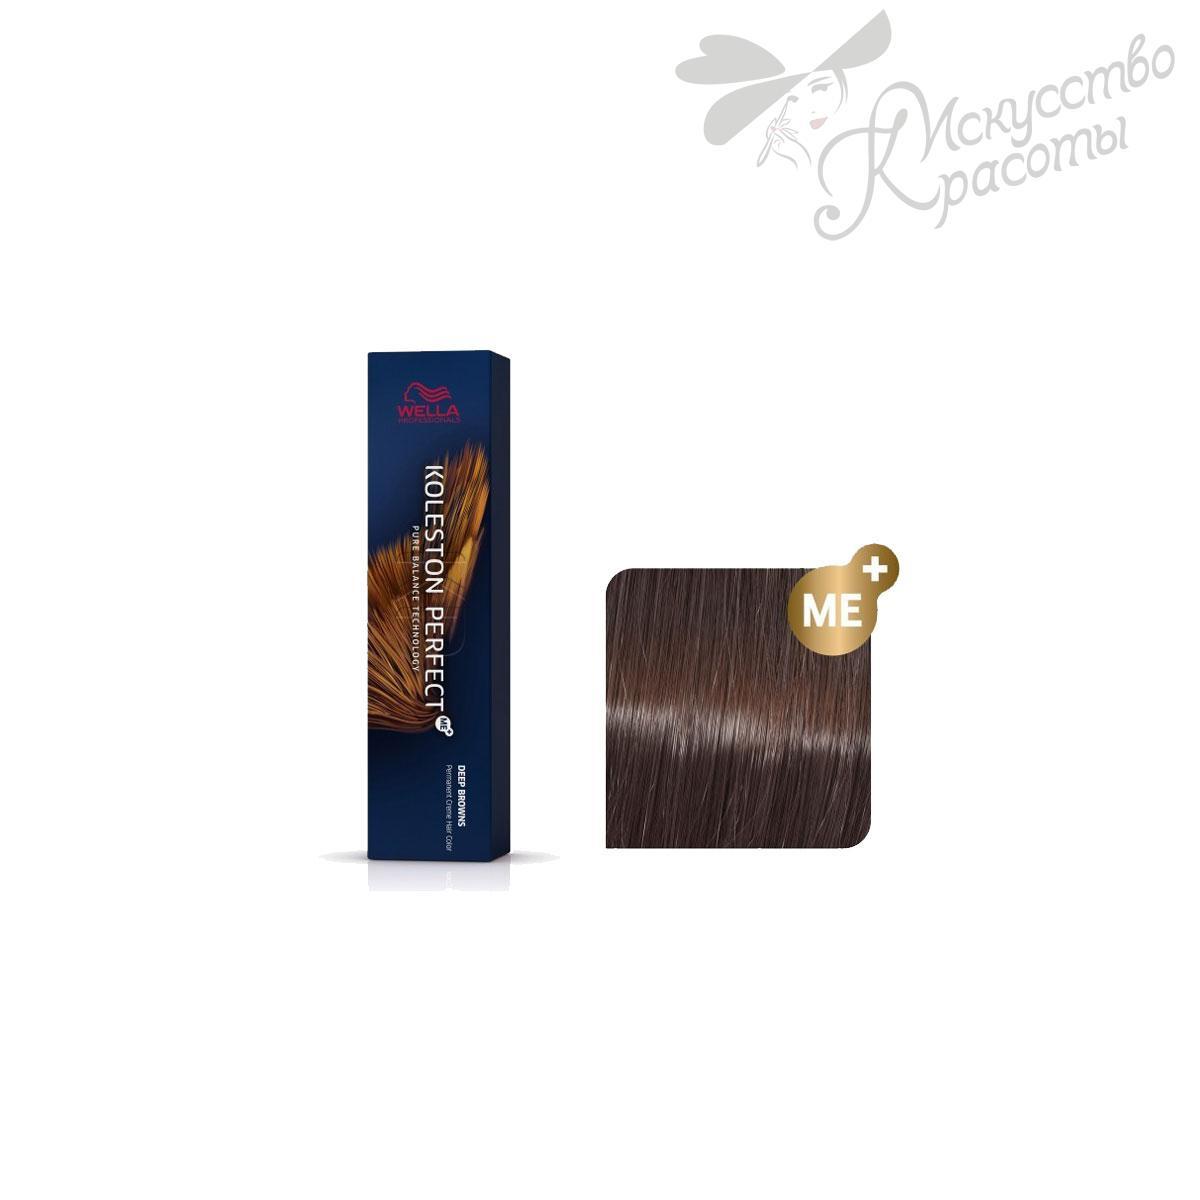 Wella Koleston 6/7 шоколадно-коричневый 60 мл